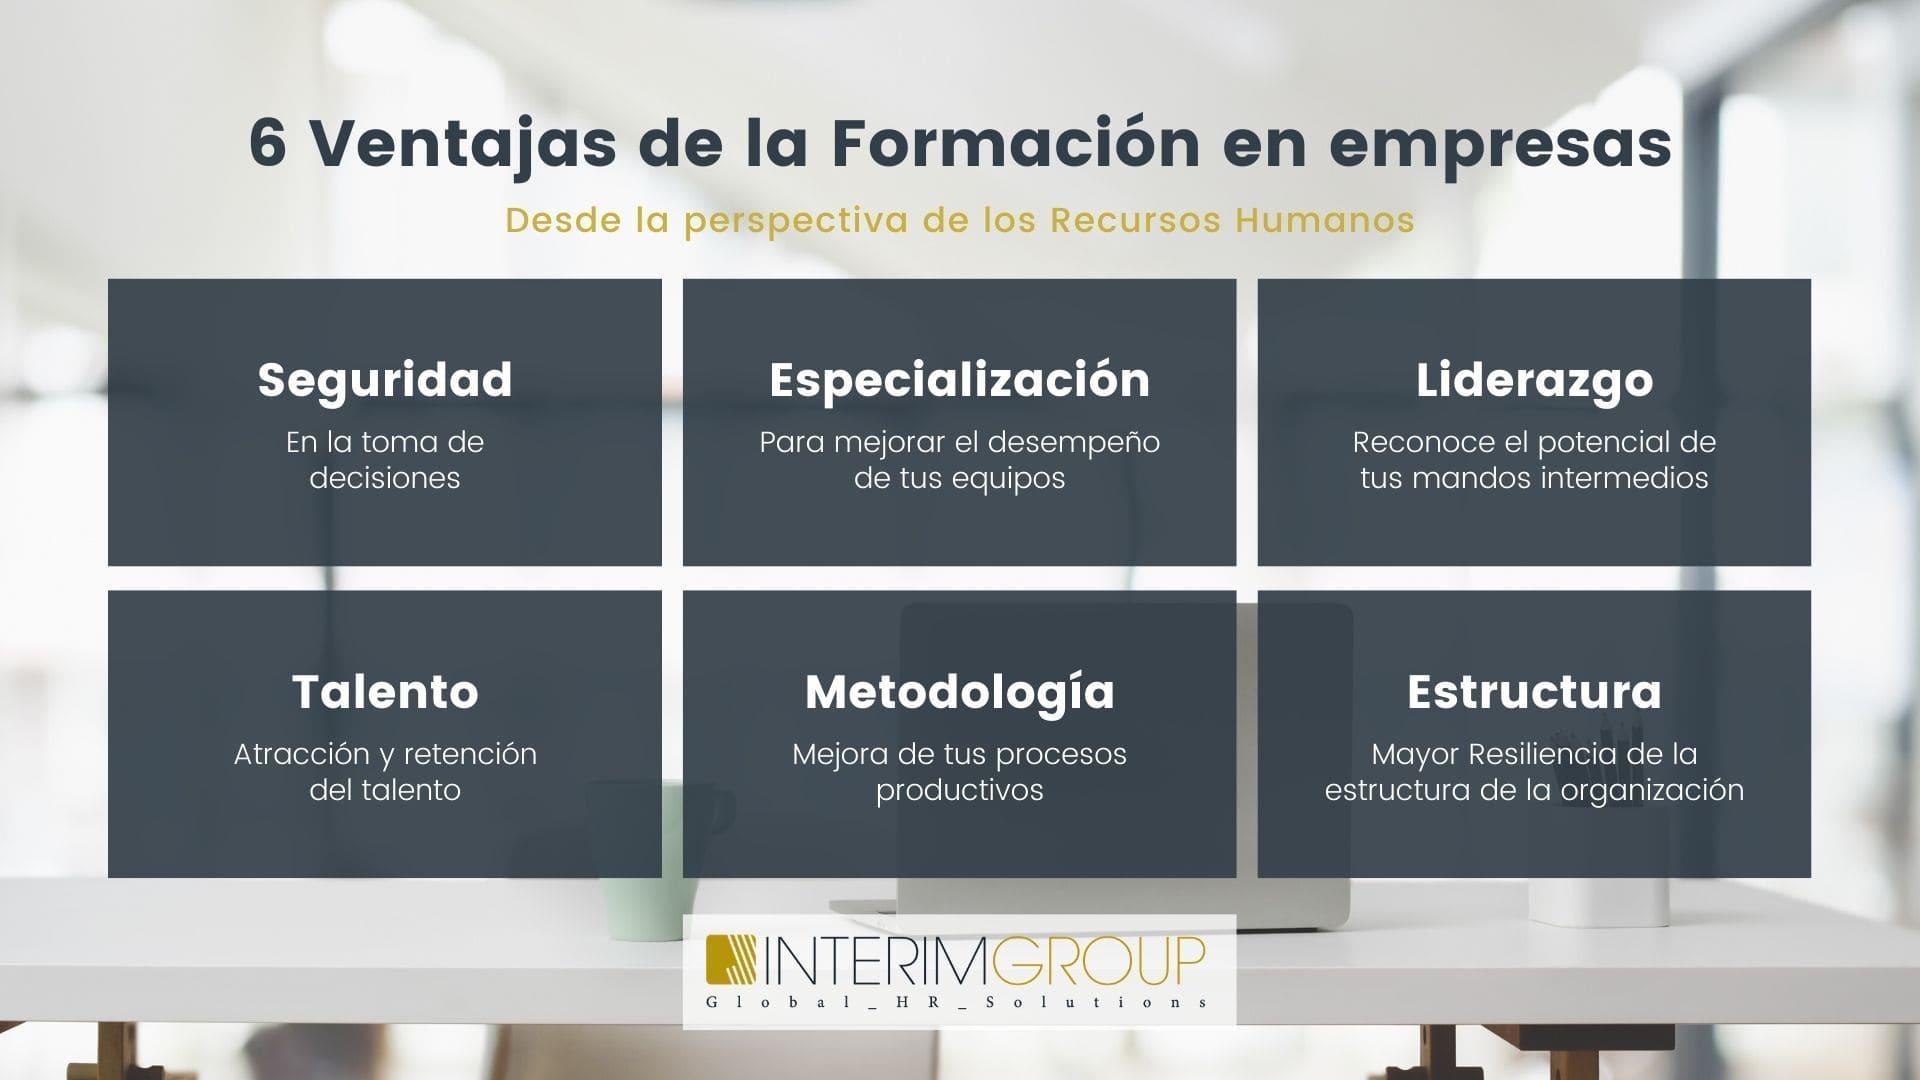 Ventajas-formacion-empresas_INTERIM-GROUP